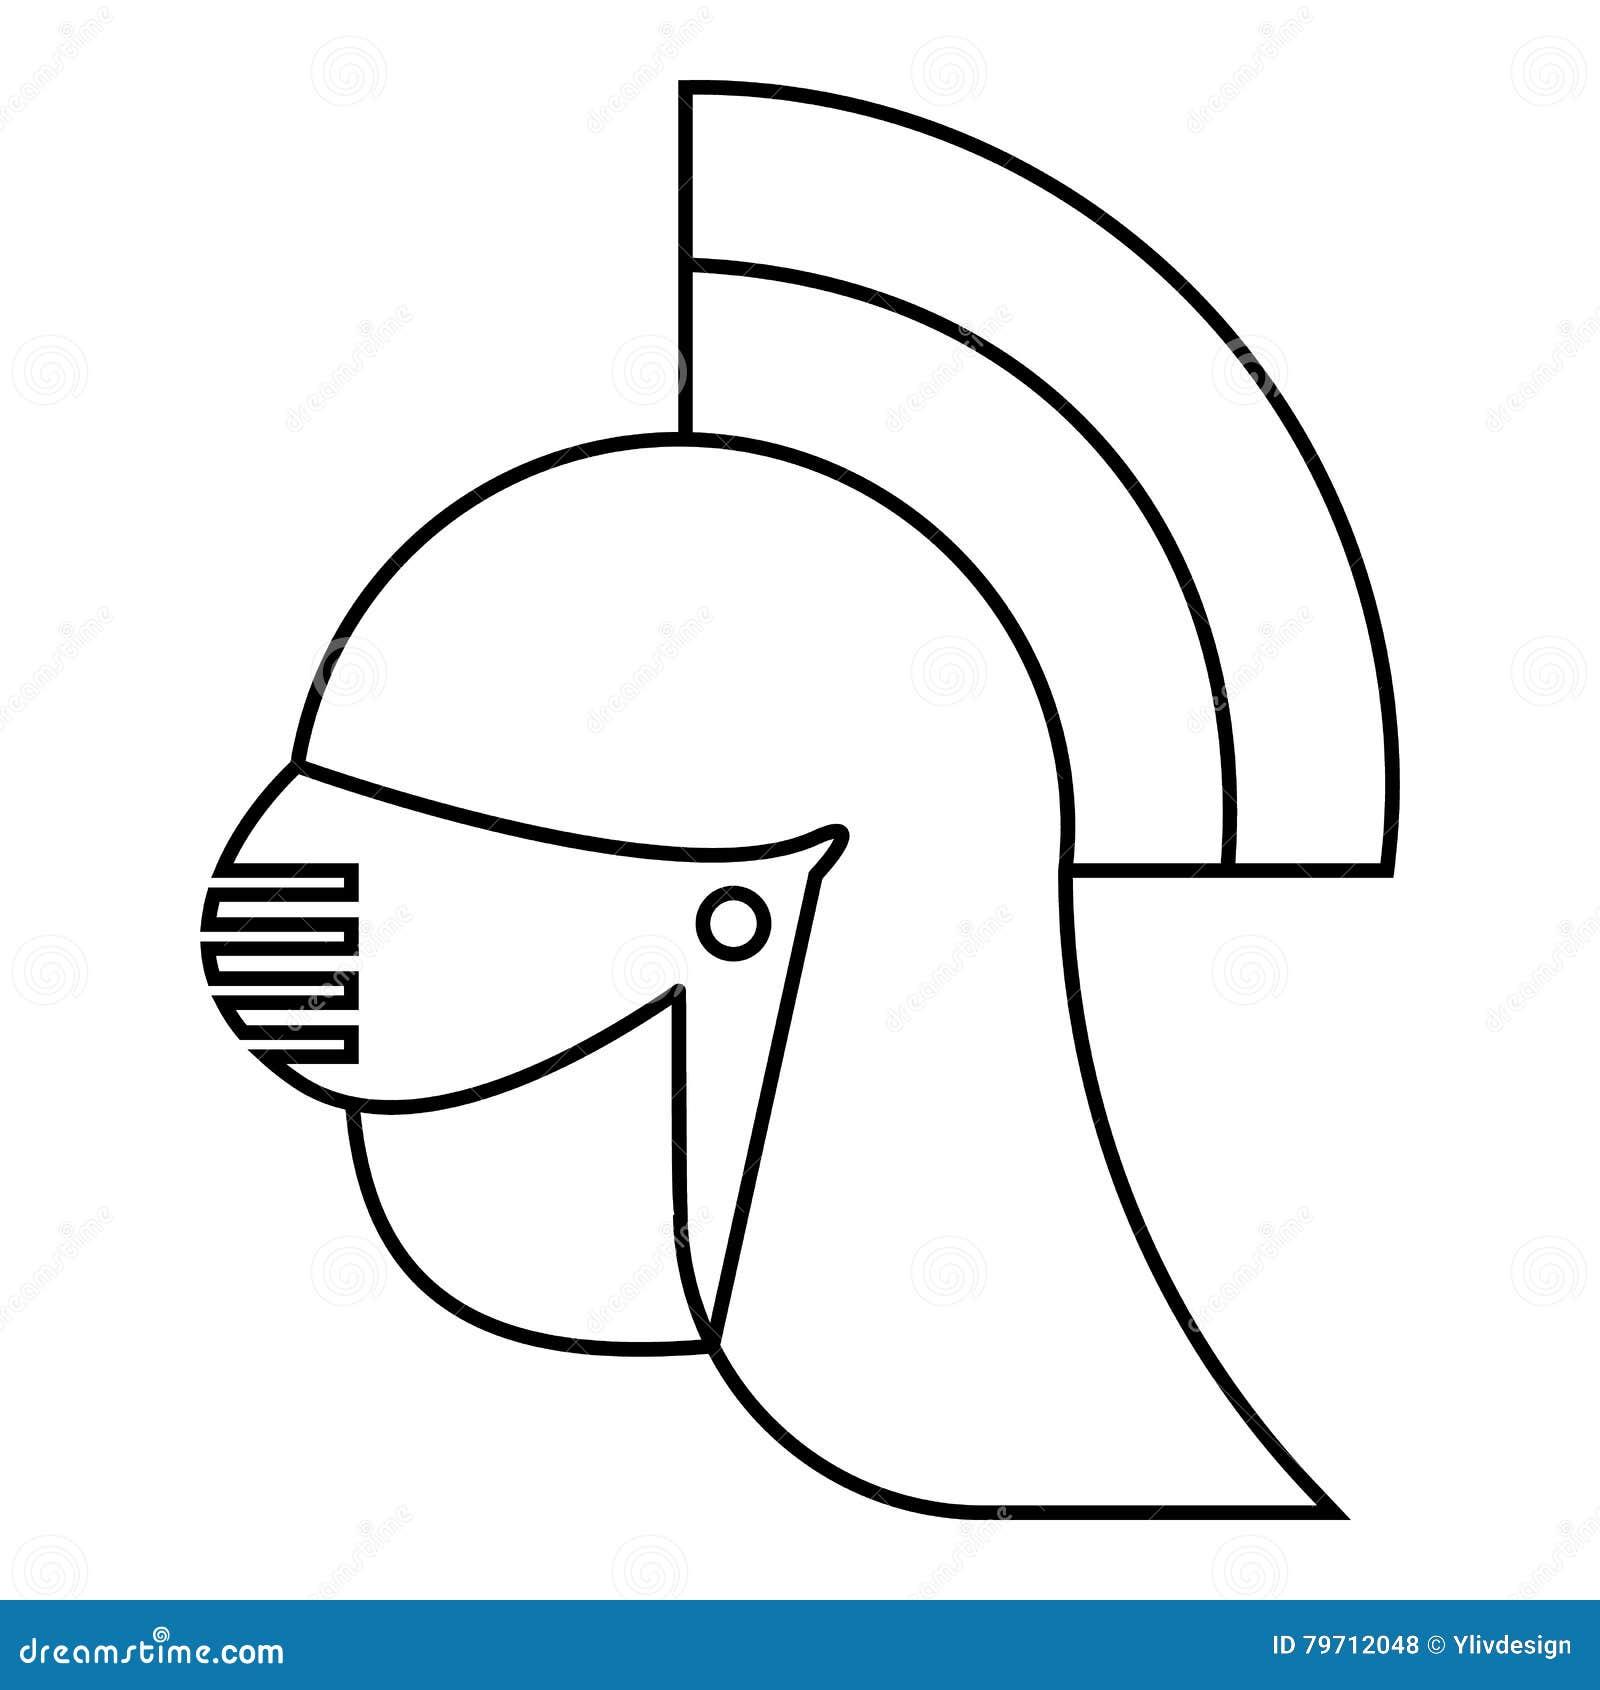 Viking Helmet Template, Minnisota Vikings Helmet Pages Coloring Pages